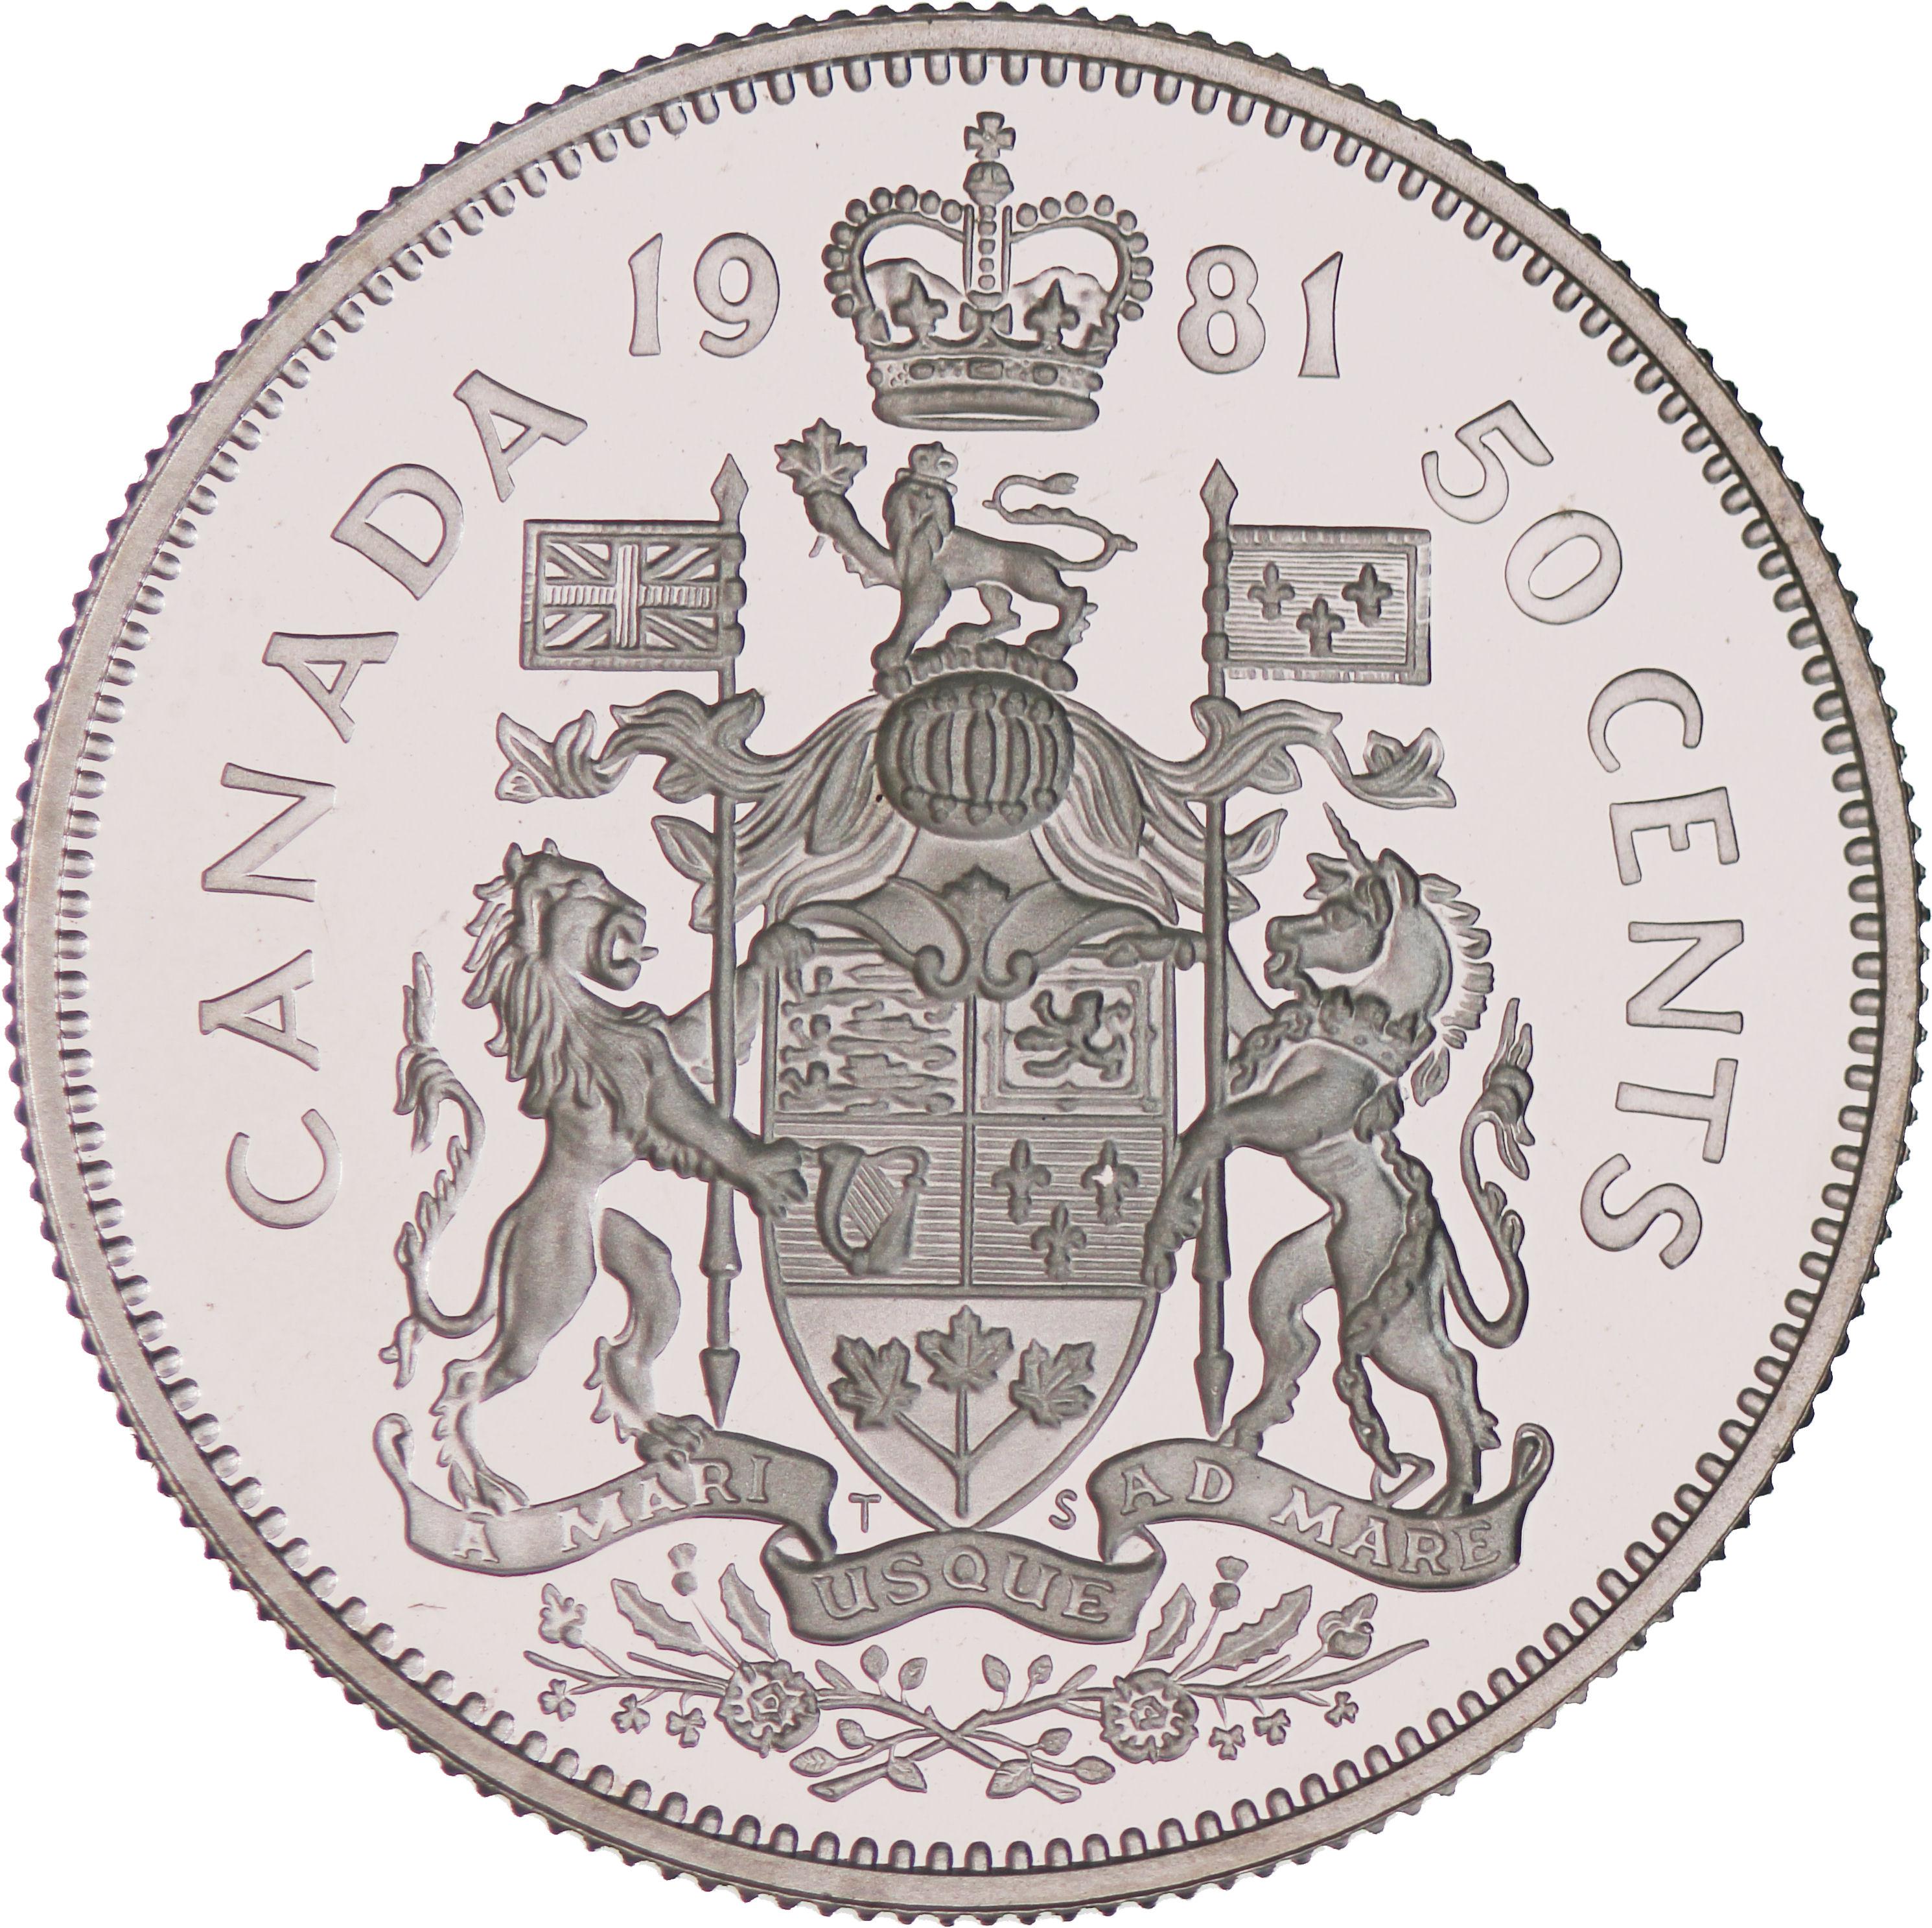 50 Cents Elizabeth Ii 2nd Portrait Canada Numista